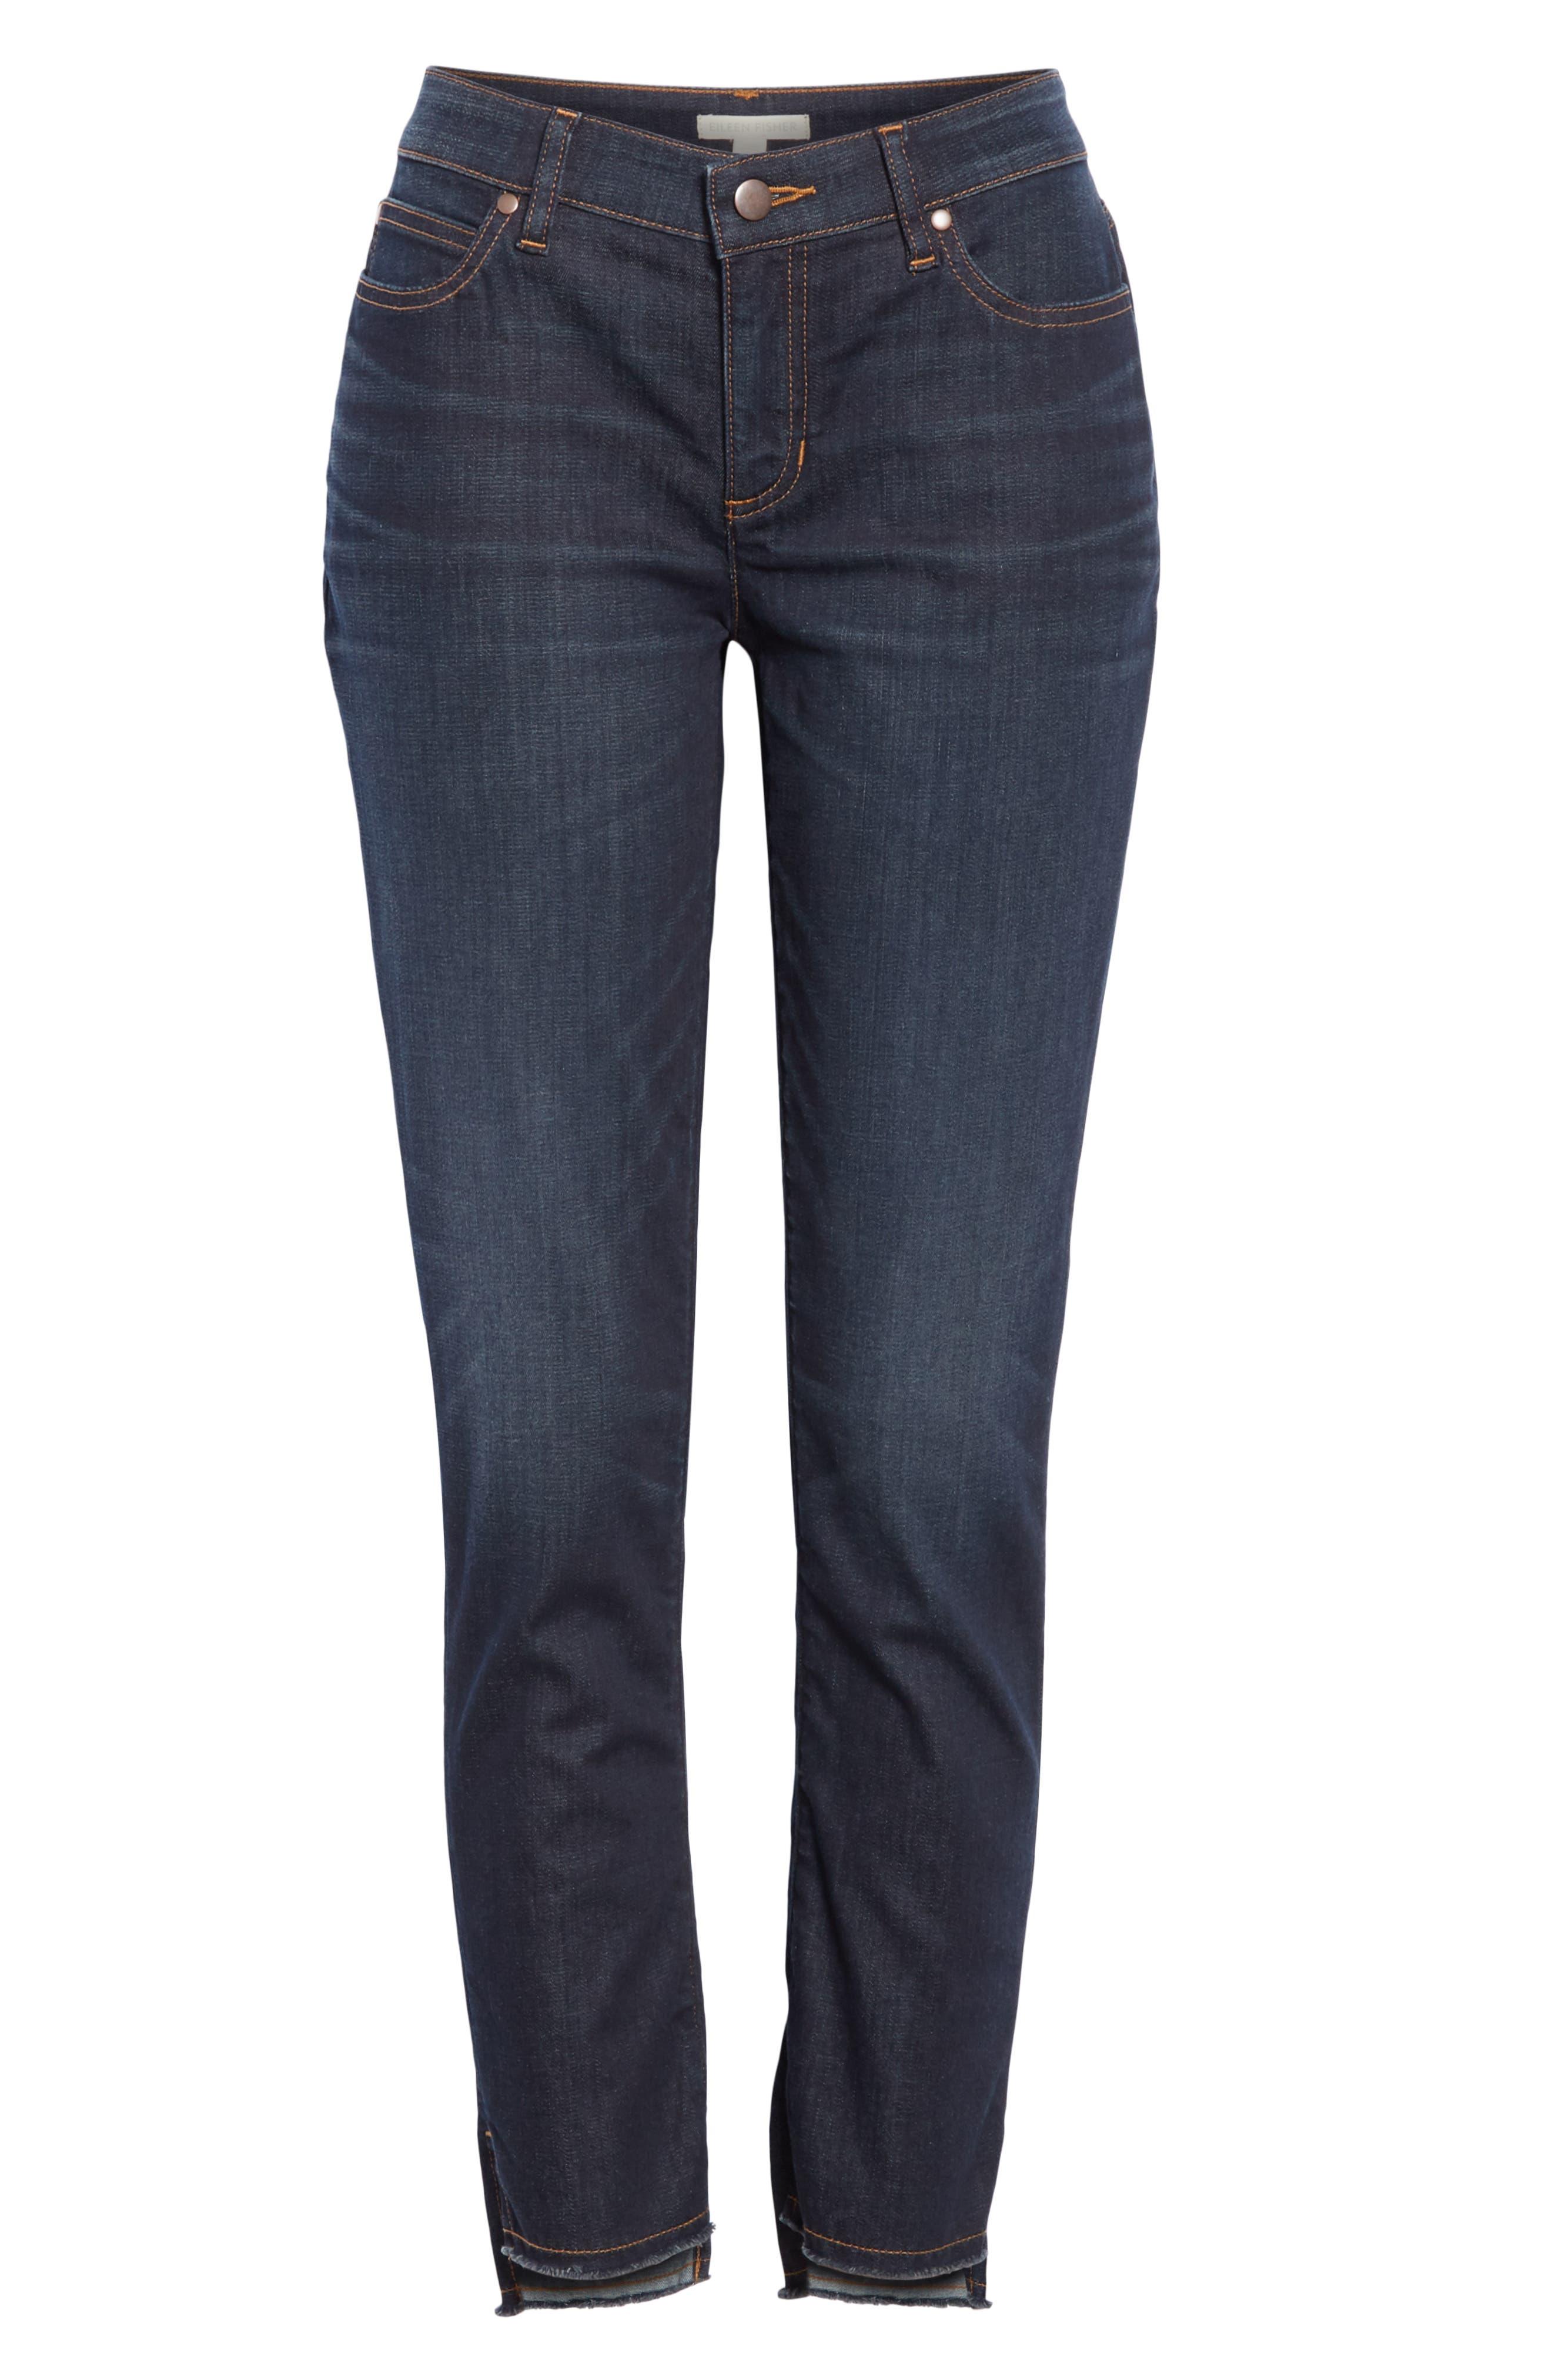 EILEEN FISHER, Raw Step Hem Slim Ankle Jeans, Alternate thumbnail 7, color, UTILITY BLUE